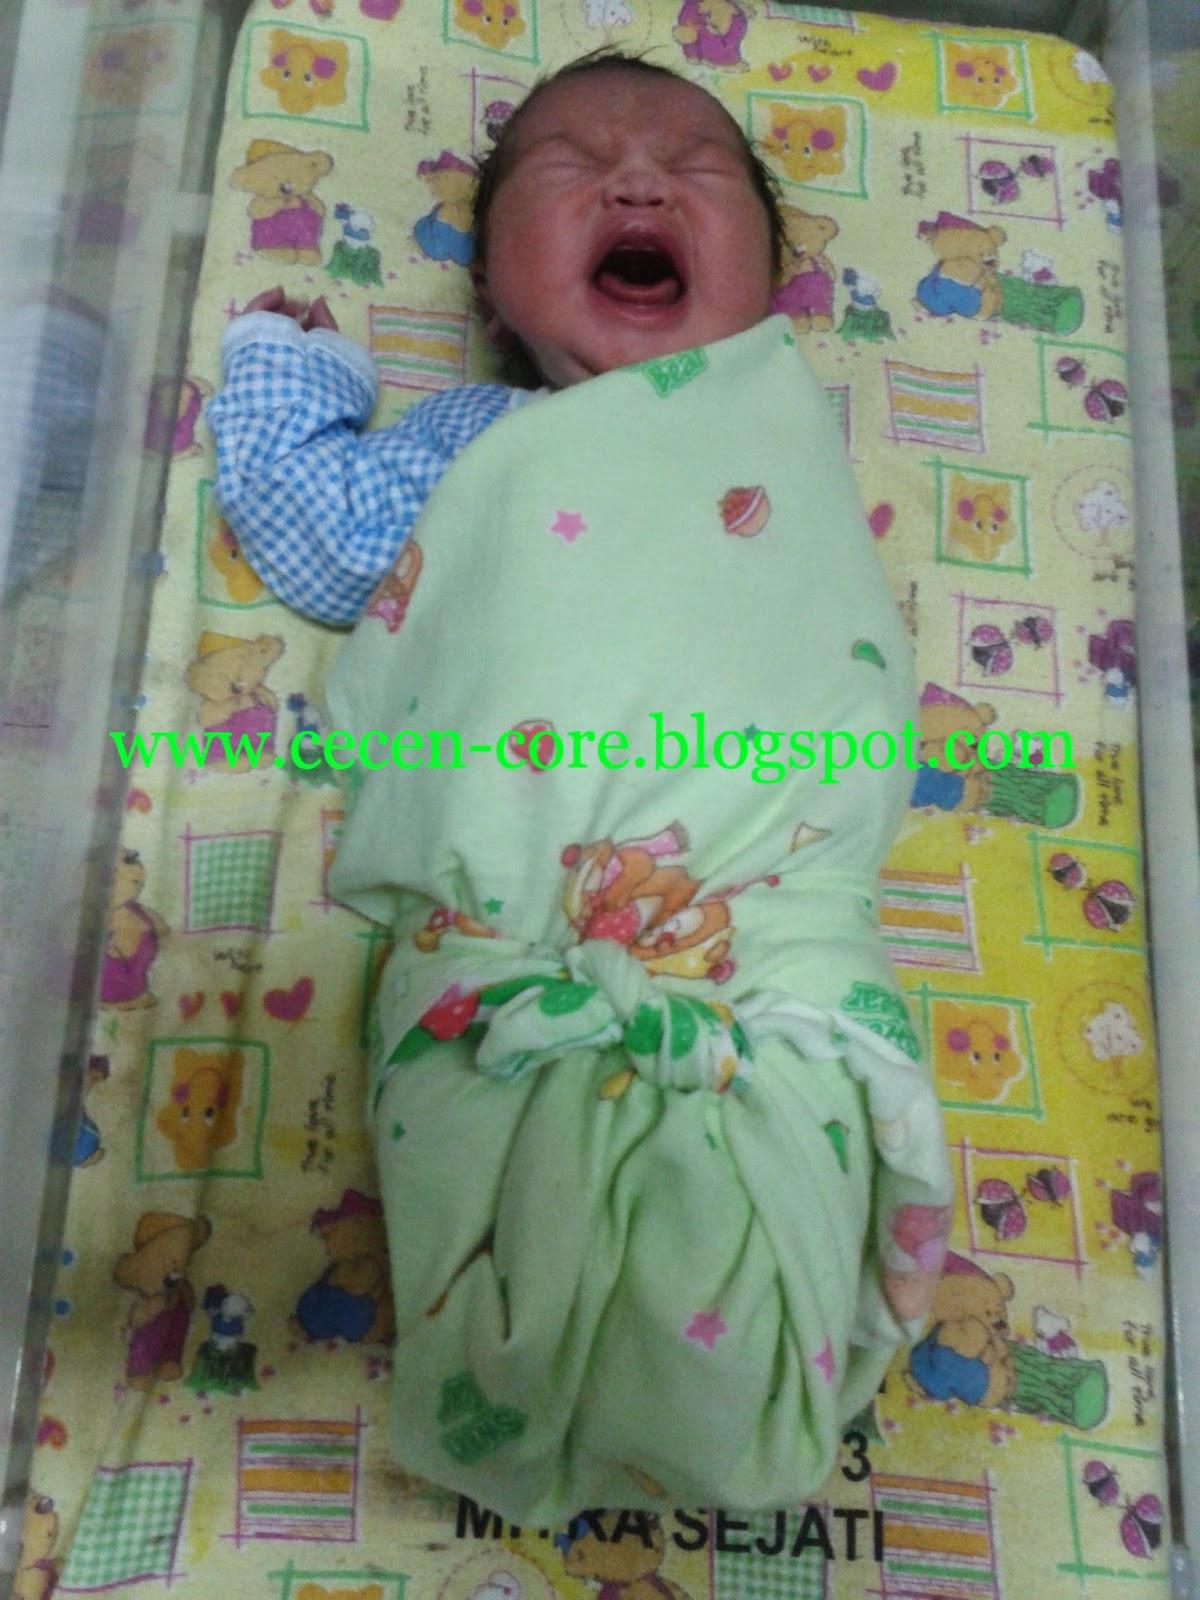 Baby Clarissa Astrid Sofia Friezcen